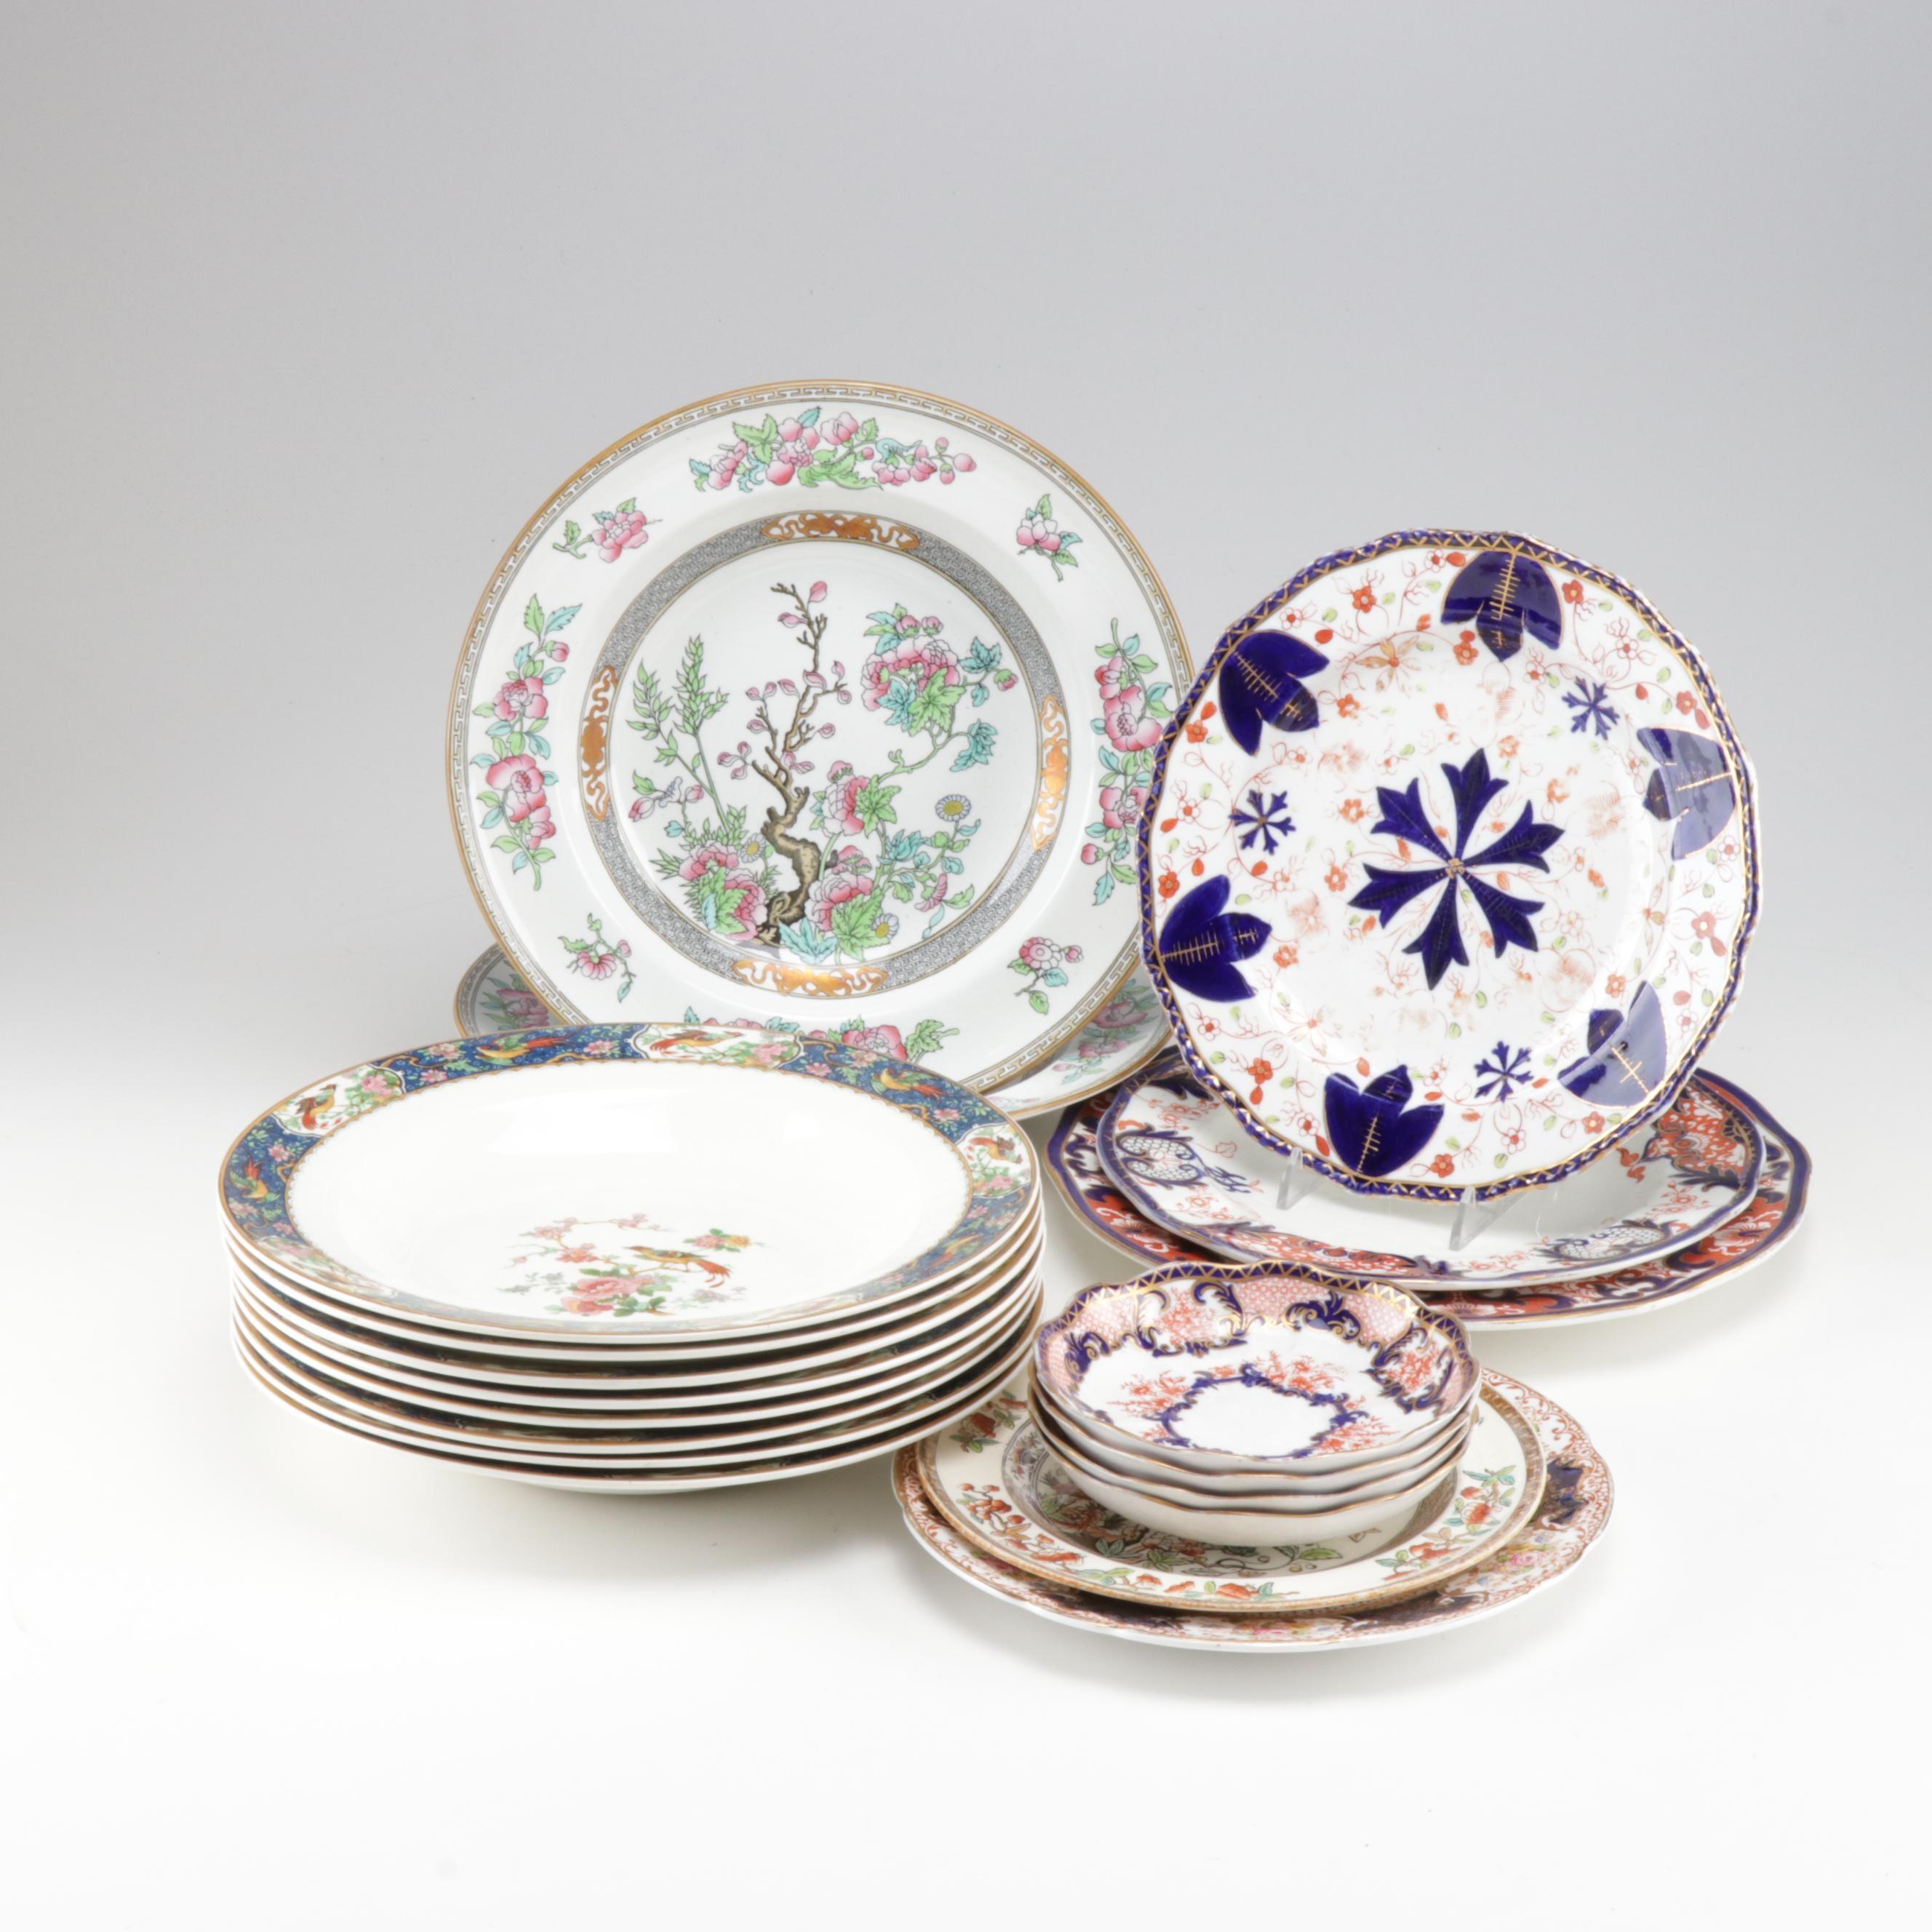 Asian Motif Bowls and Plate Assortment